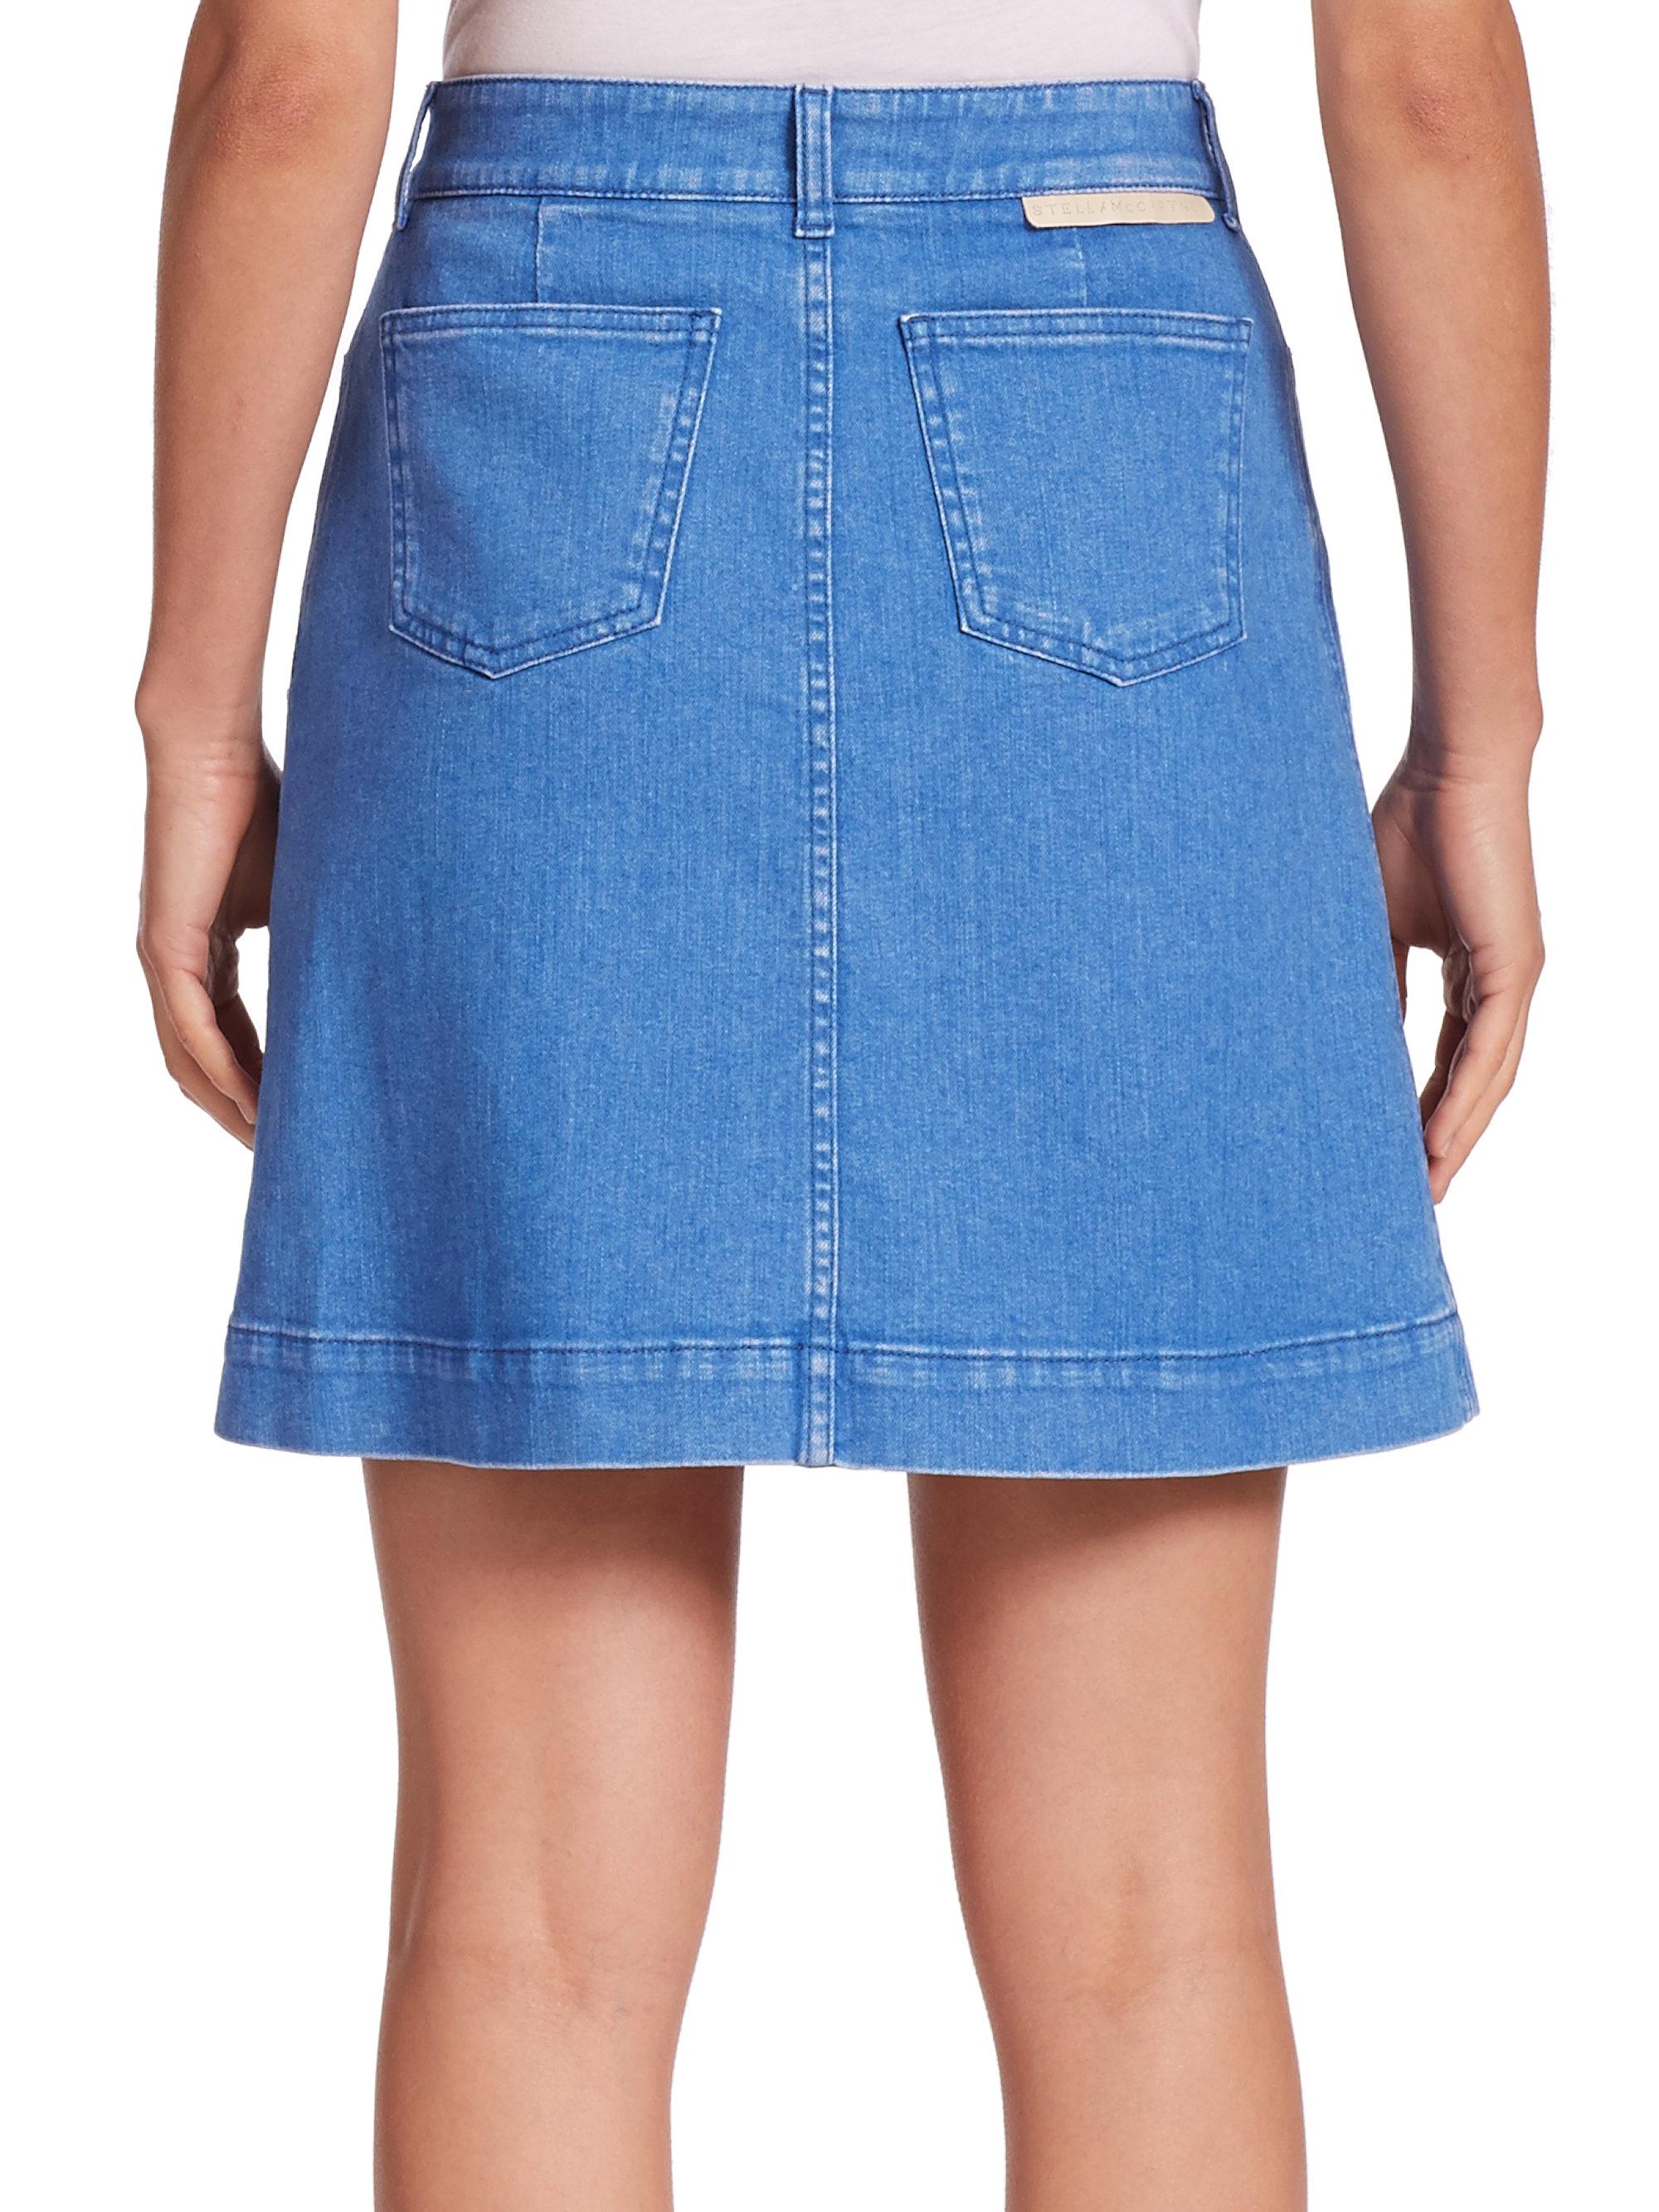 stella mccartney button front a line denim skirt in blue